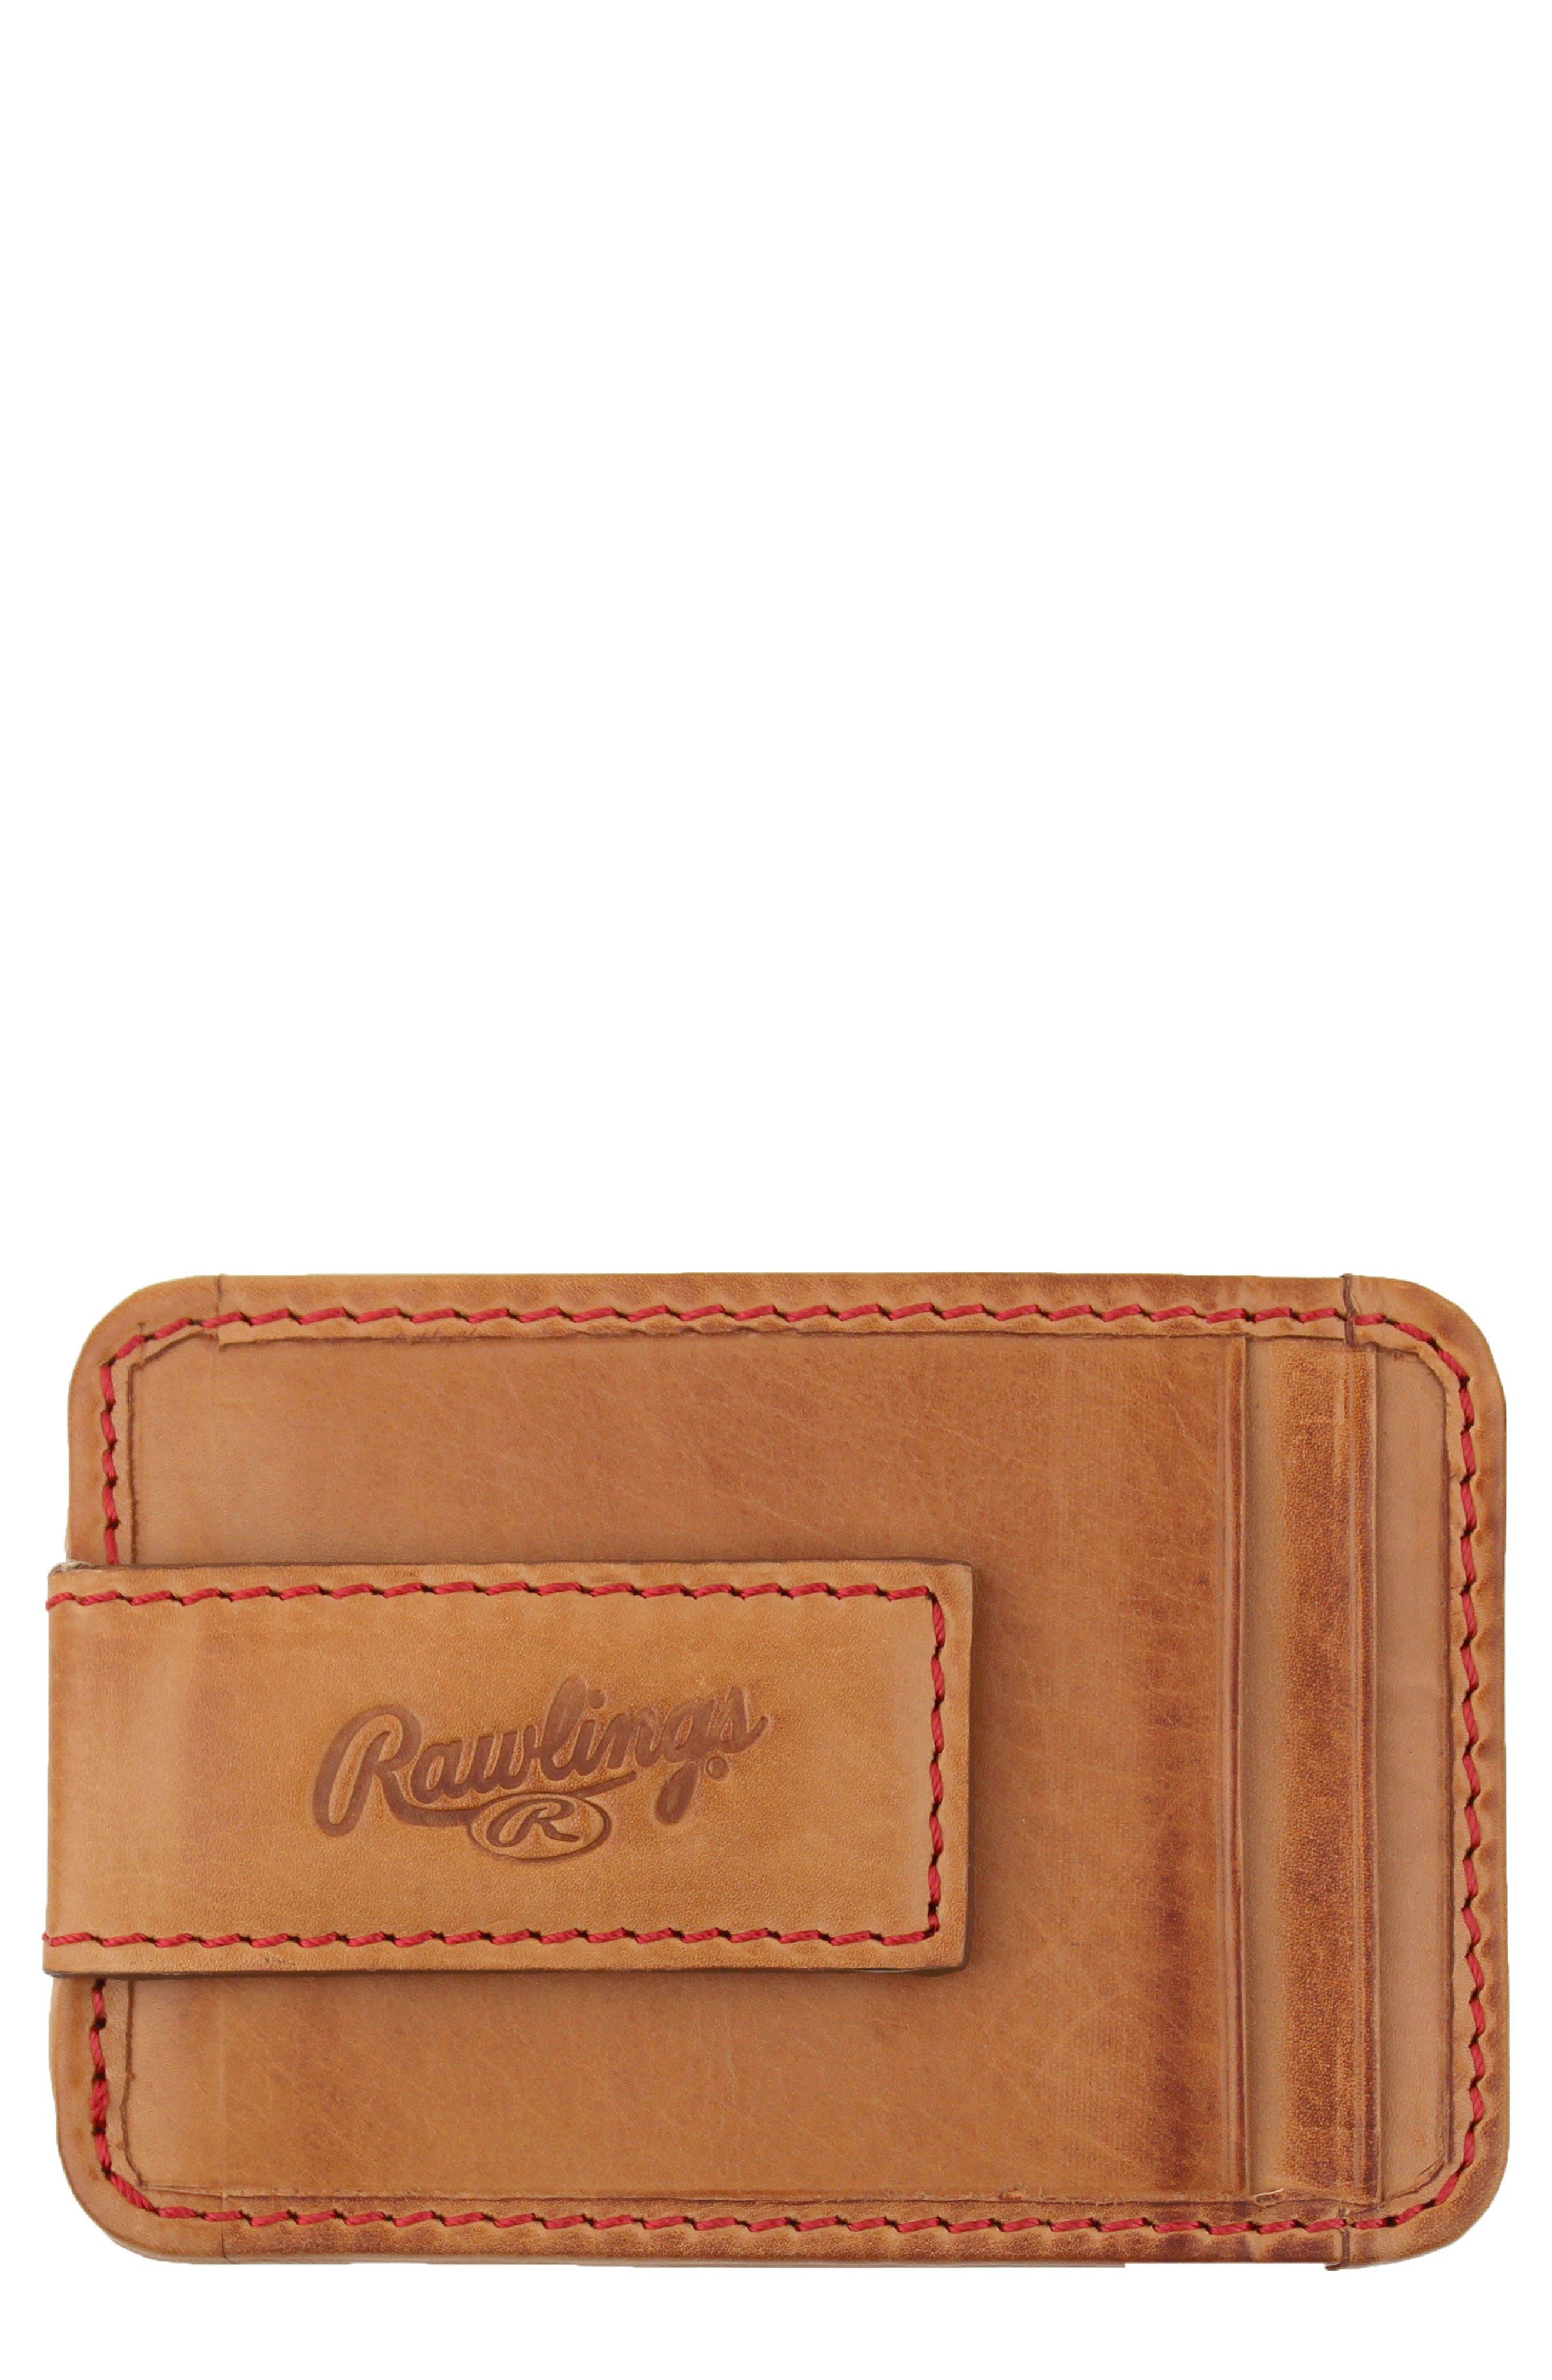 Main Image - Rawlings Baseball Stitch Money Clip Card Case